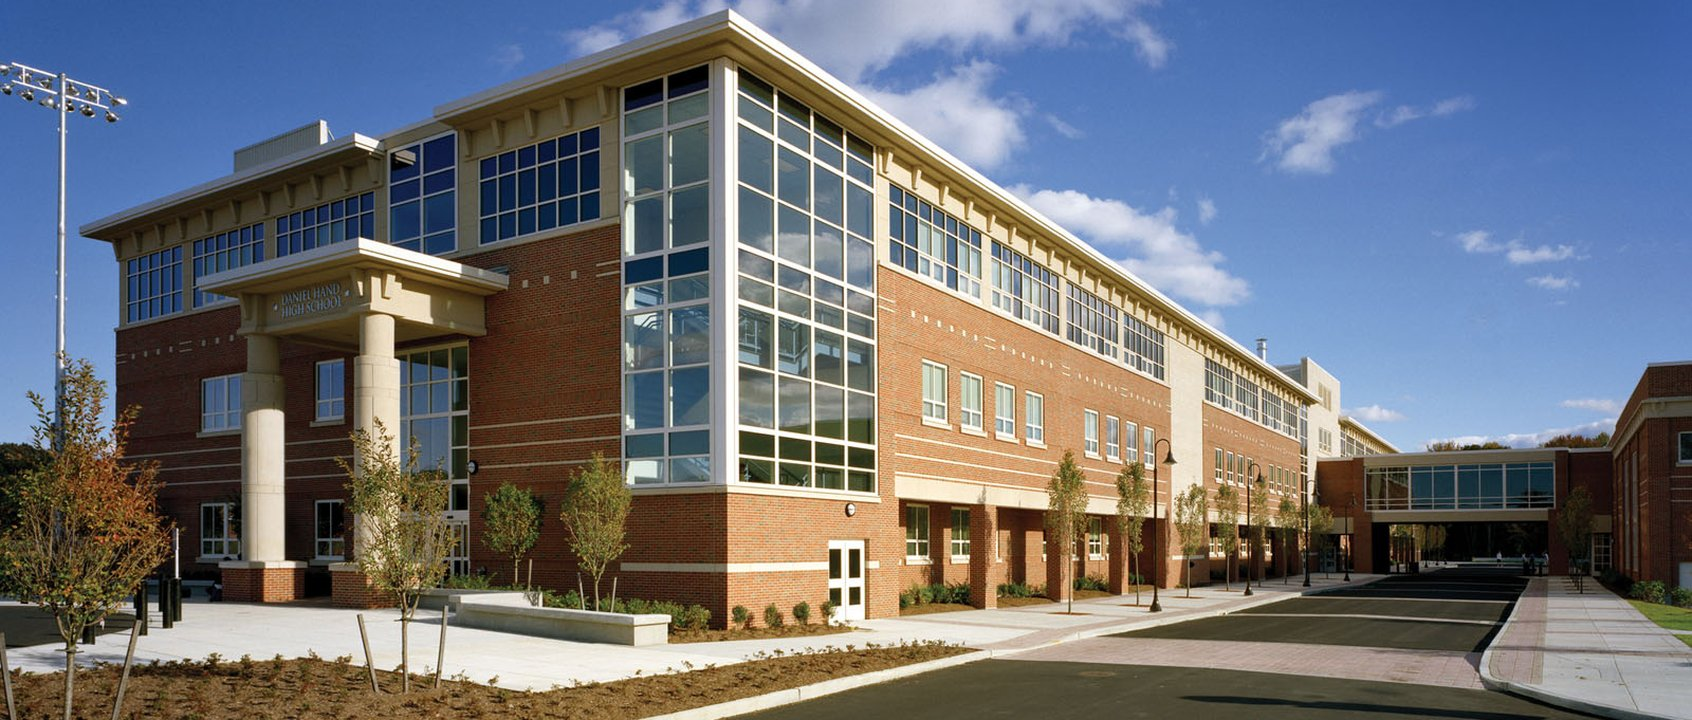 K 12 Public Schools